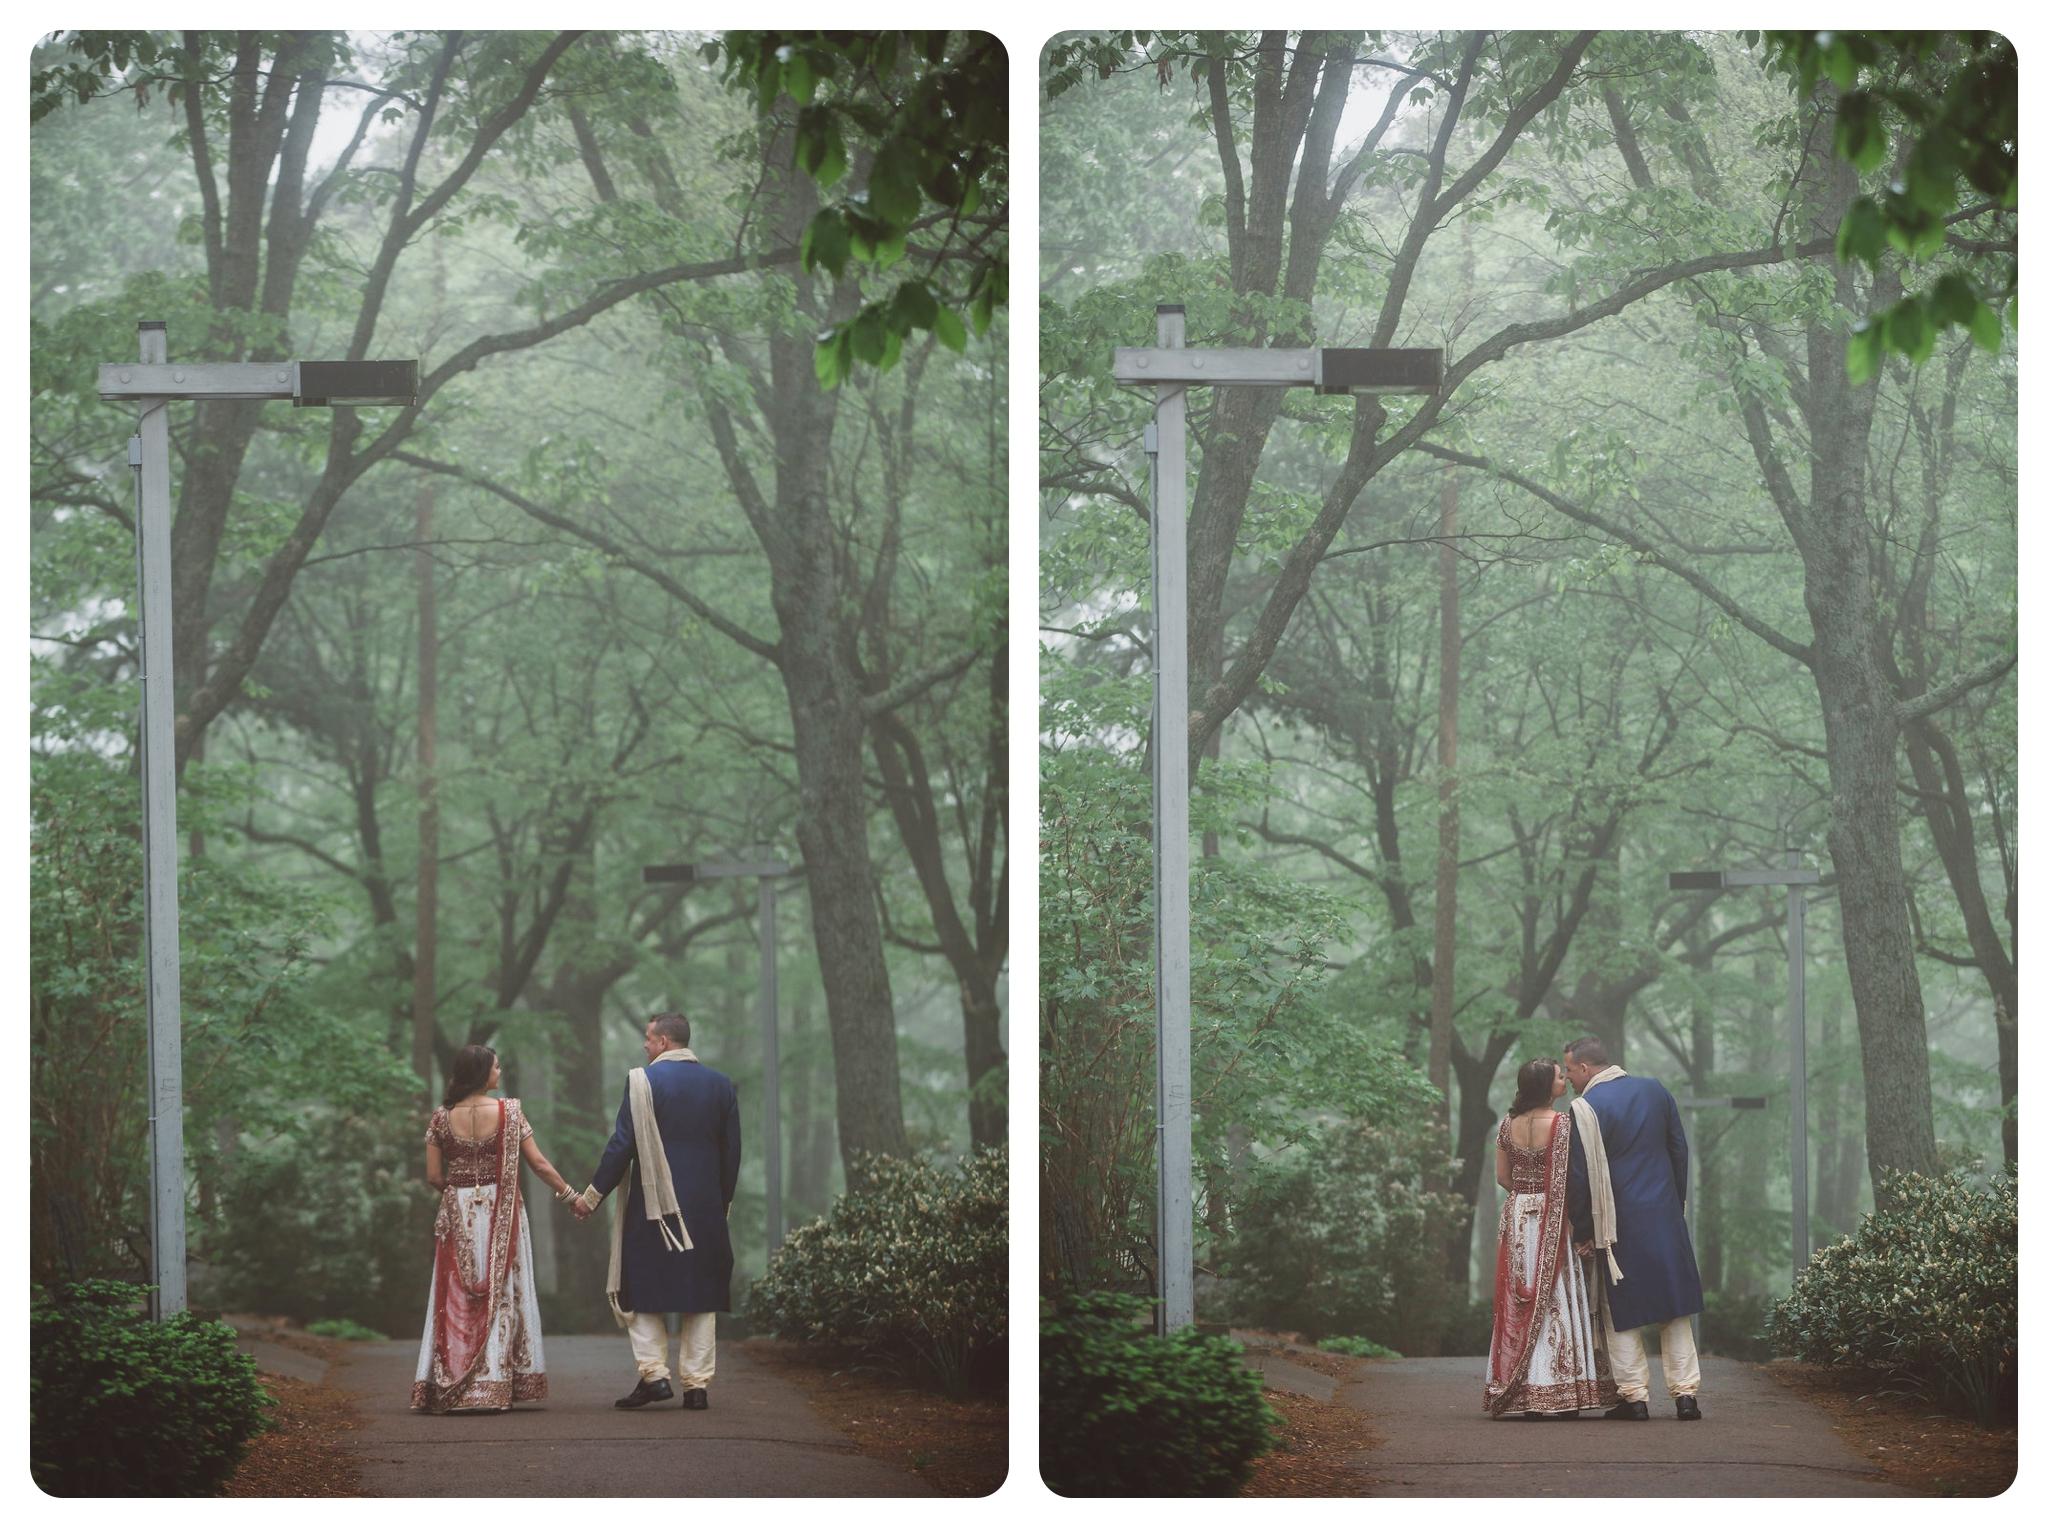 Virginia-Weddings-Center-in-the-Square-Pat-Cori-Photography-026.jpg